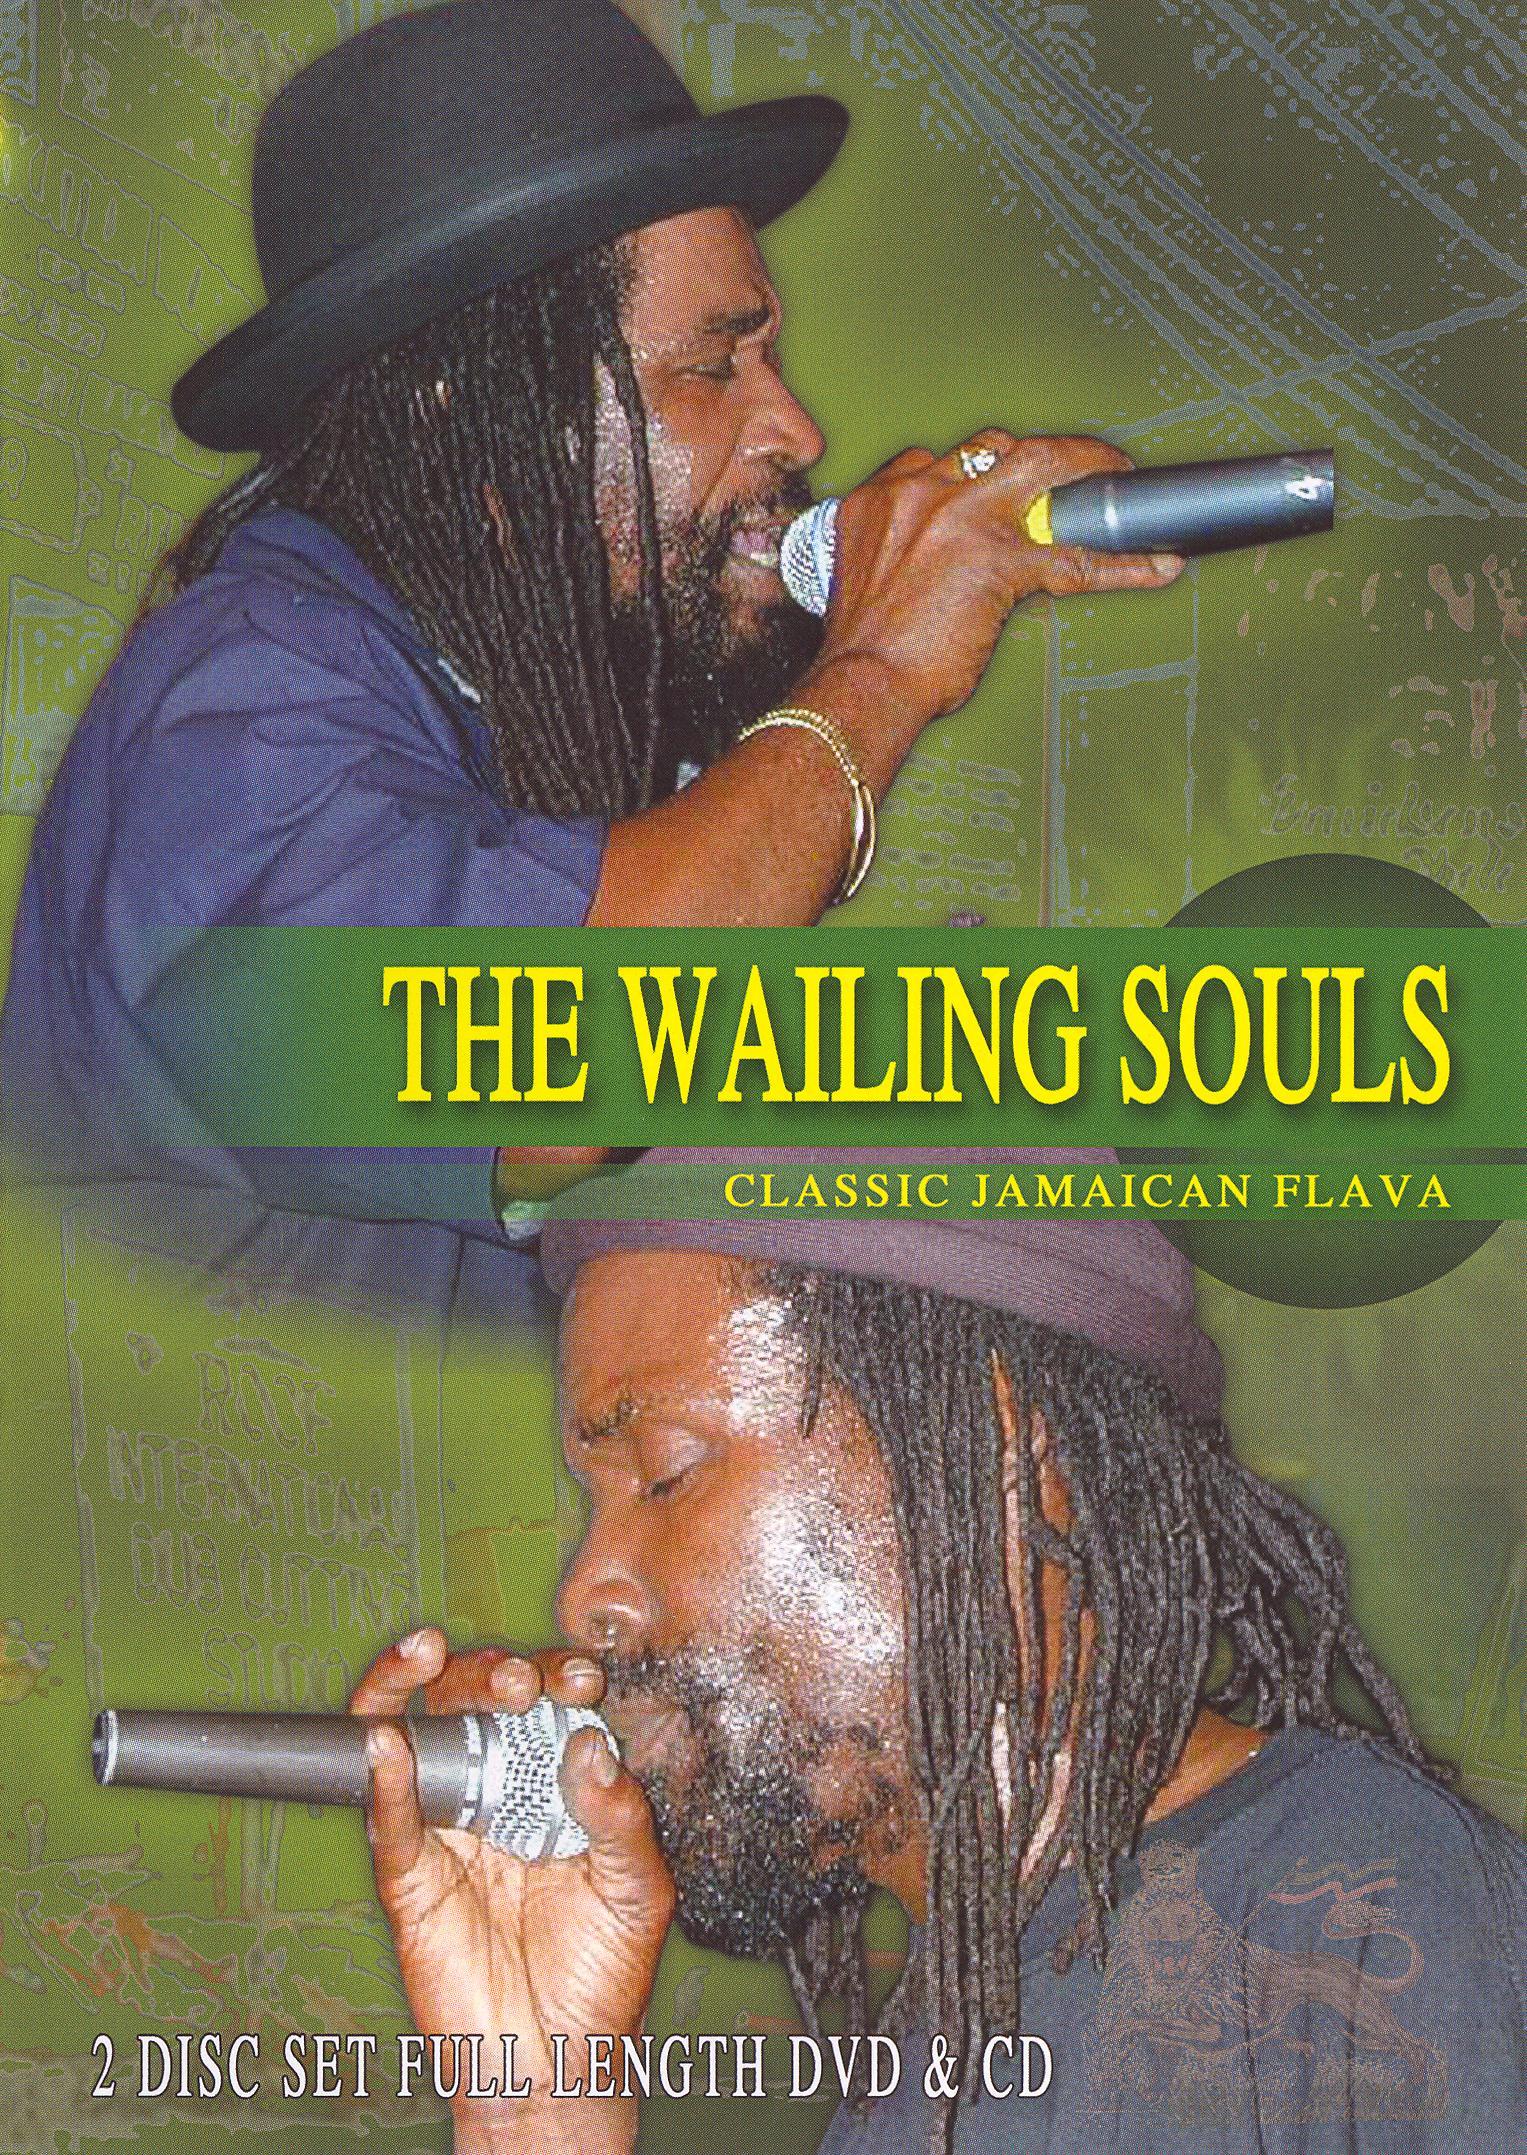 The Wailing Souls: Live in San Francisco - Classic Jamaican Flava